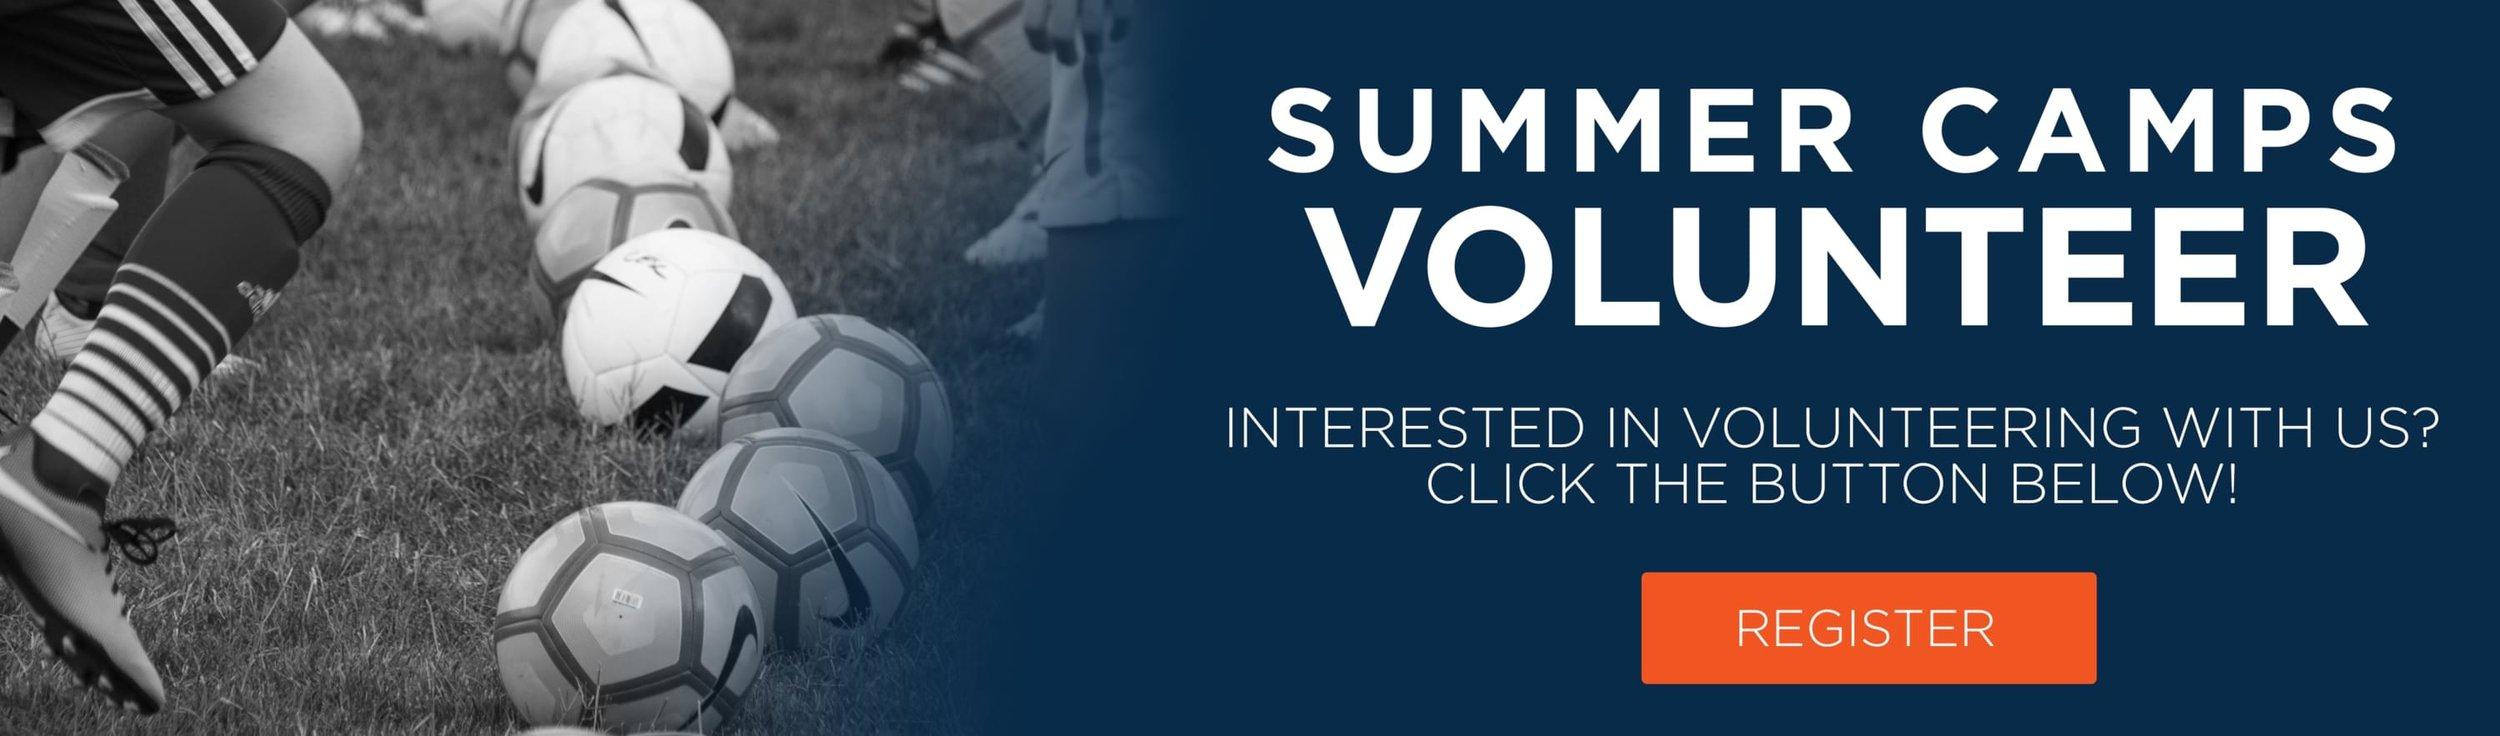 Summer Camp Volunteer.jpg